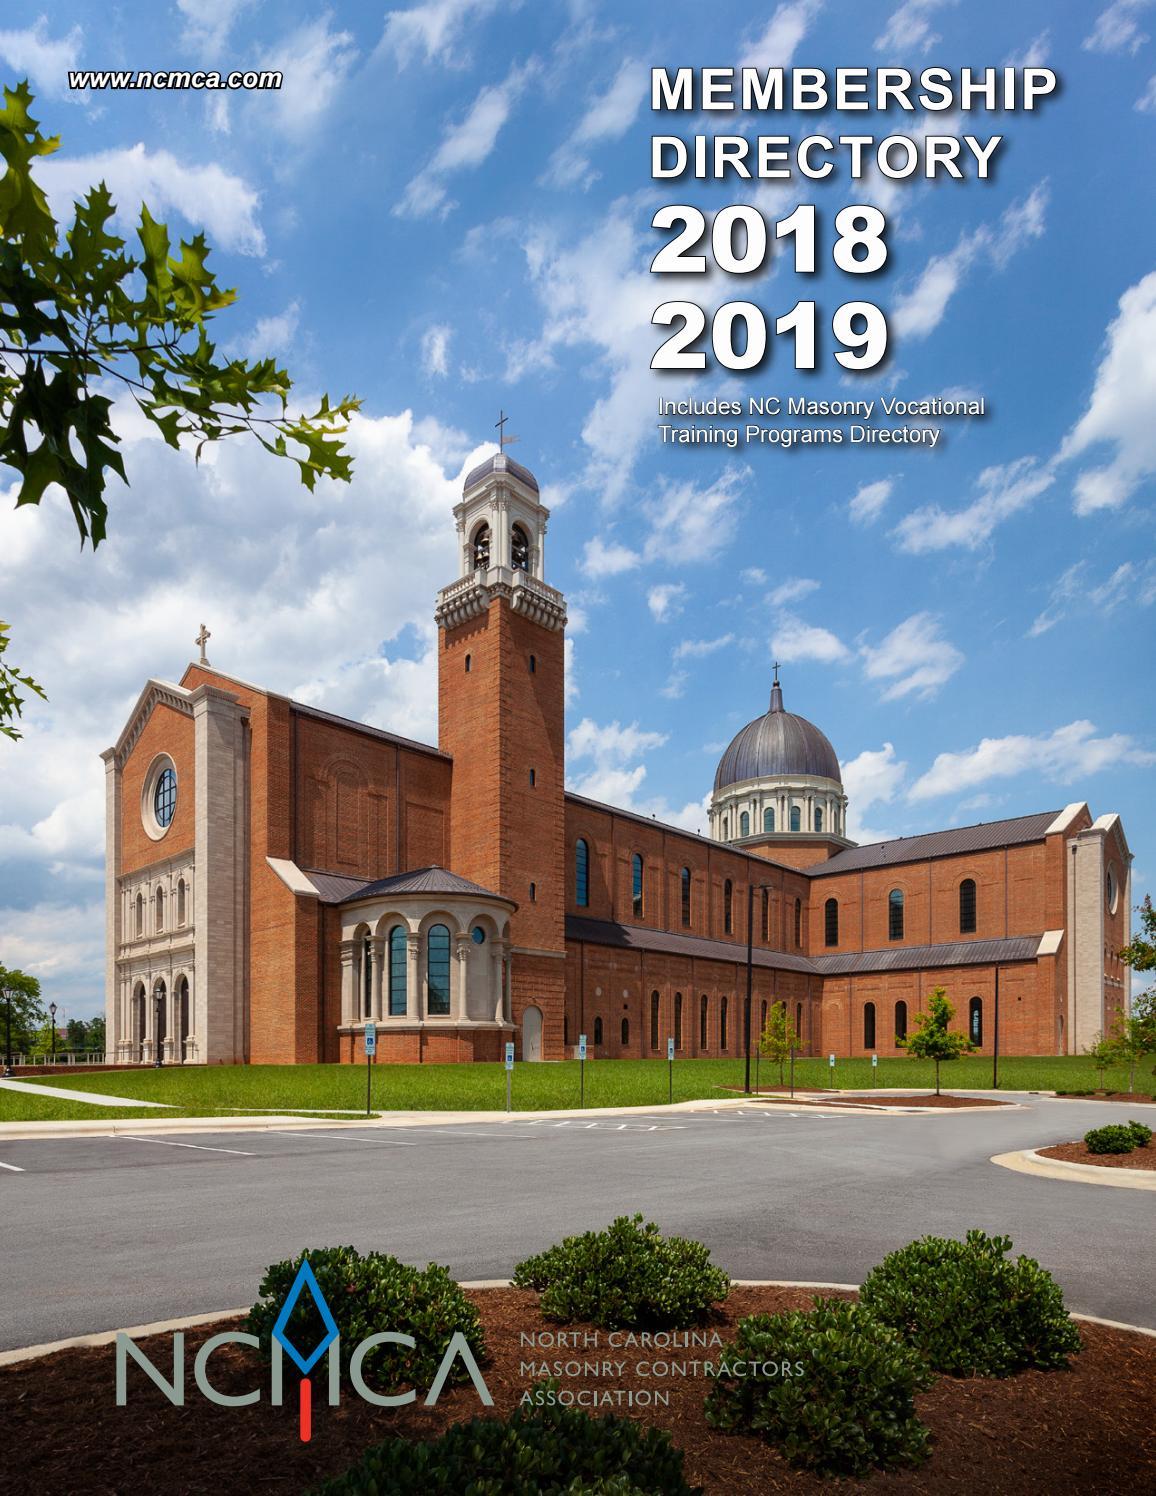 NCMCA 2018-2019 MEMBERSHIP DIRECTORY by Brandon Hartsell - issuu